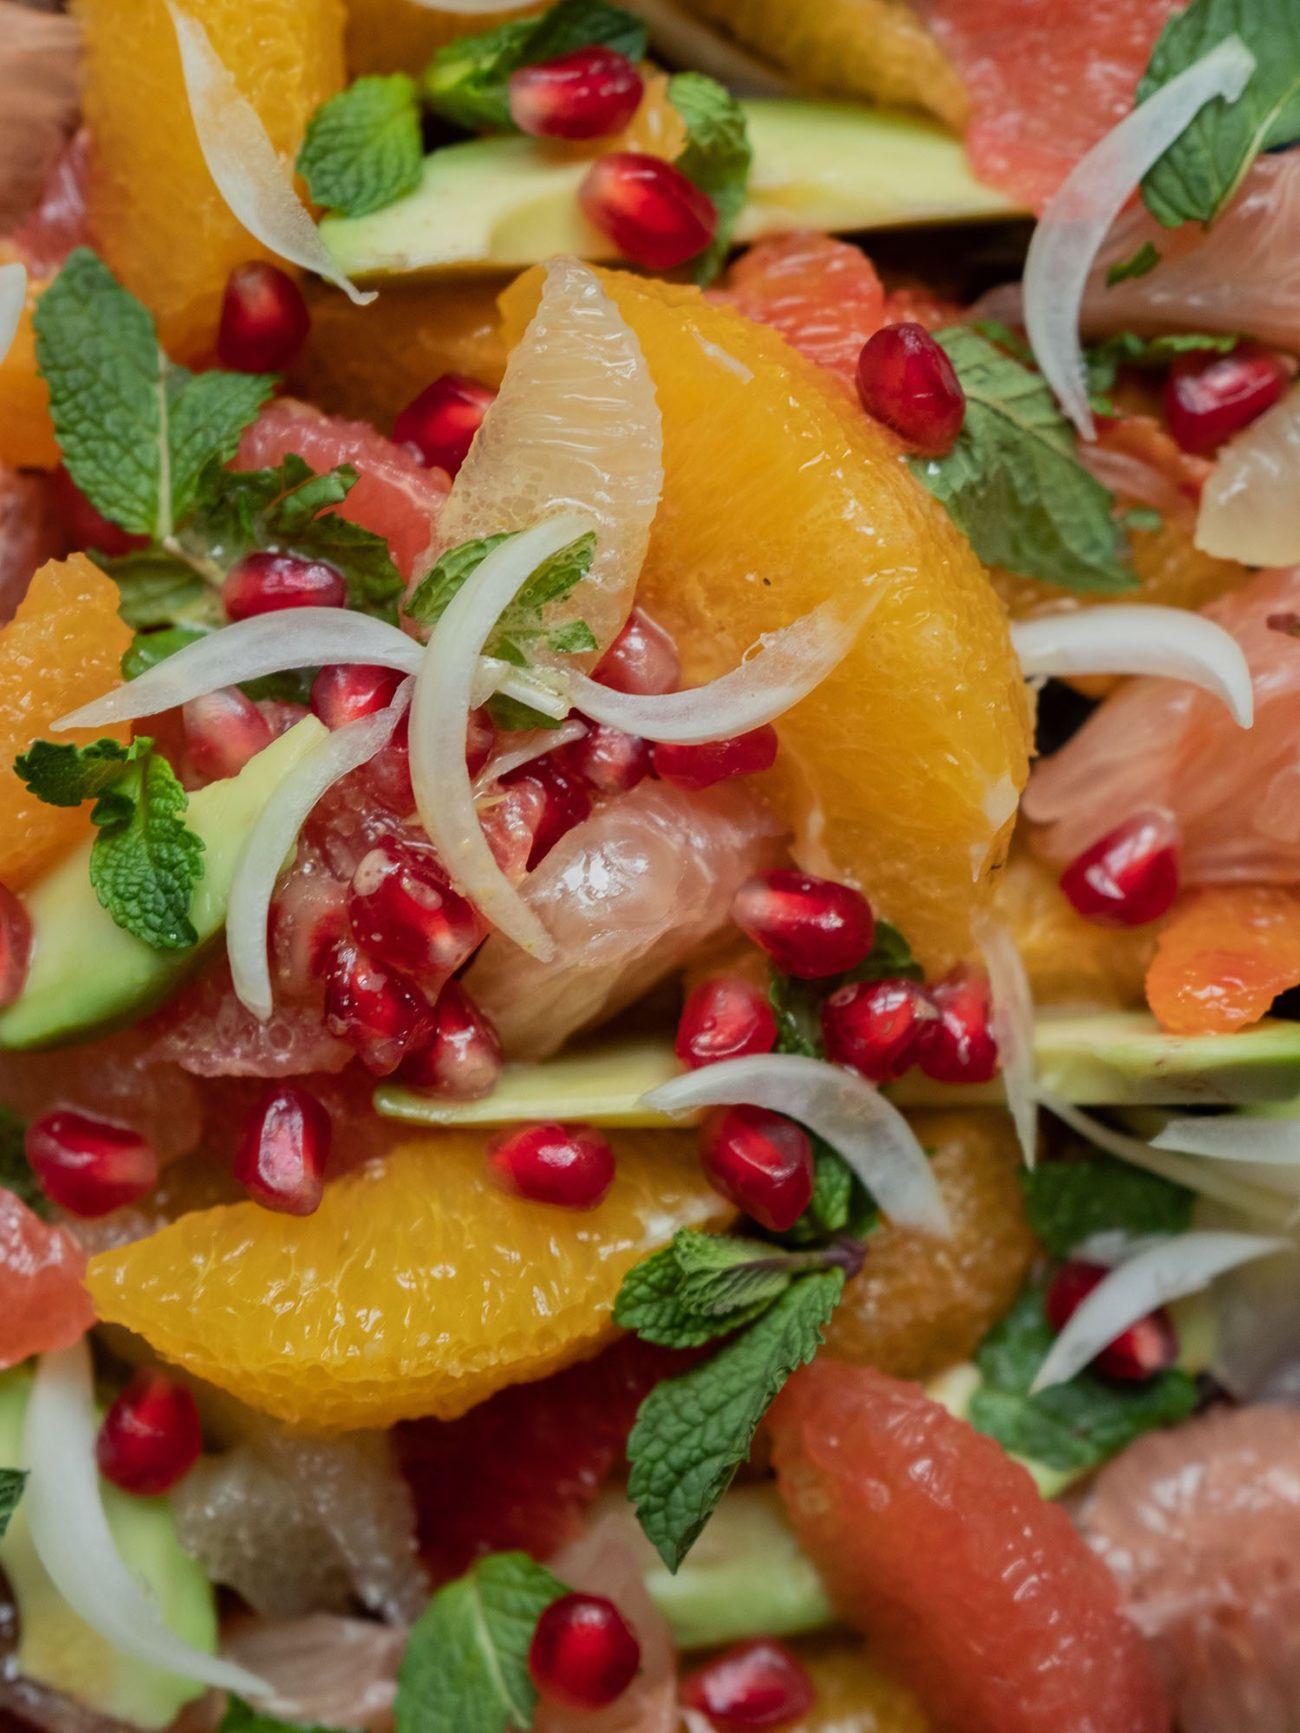 Rezept_Zitrussalat mit Avocado und Pistaziendressing, Avocado, Zitrone, Pomelo, Zwiebeln, Granatapfel Kerne